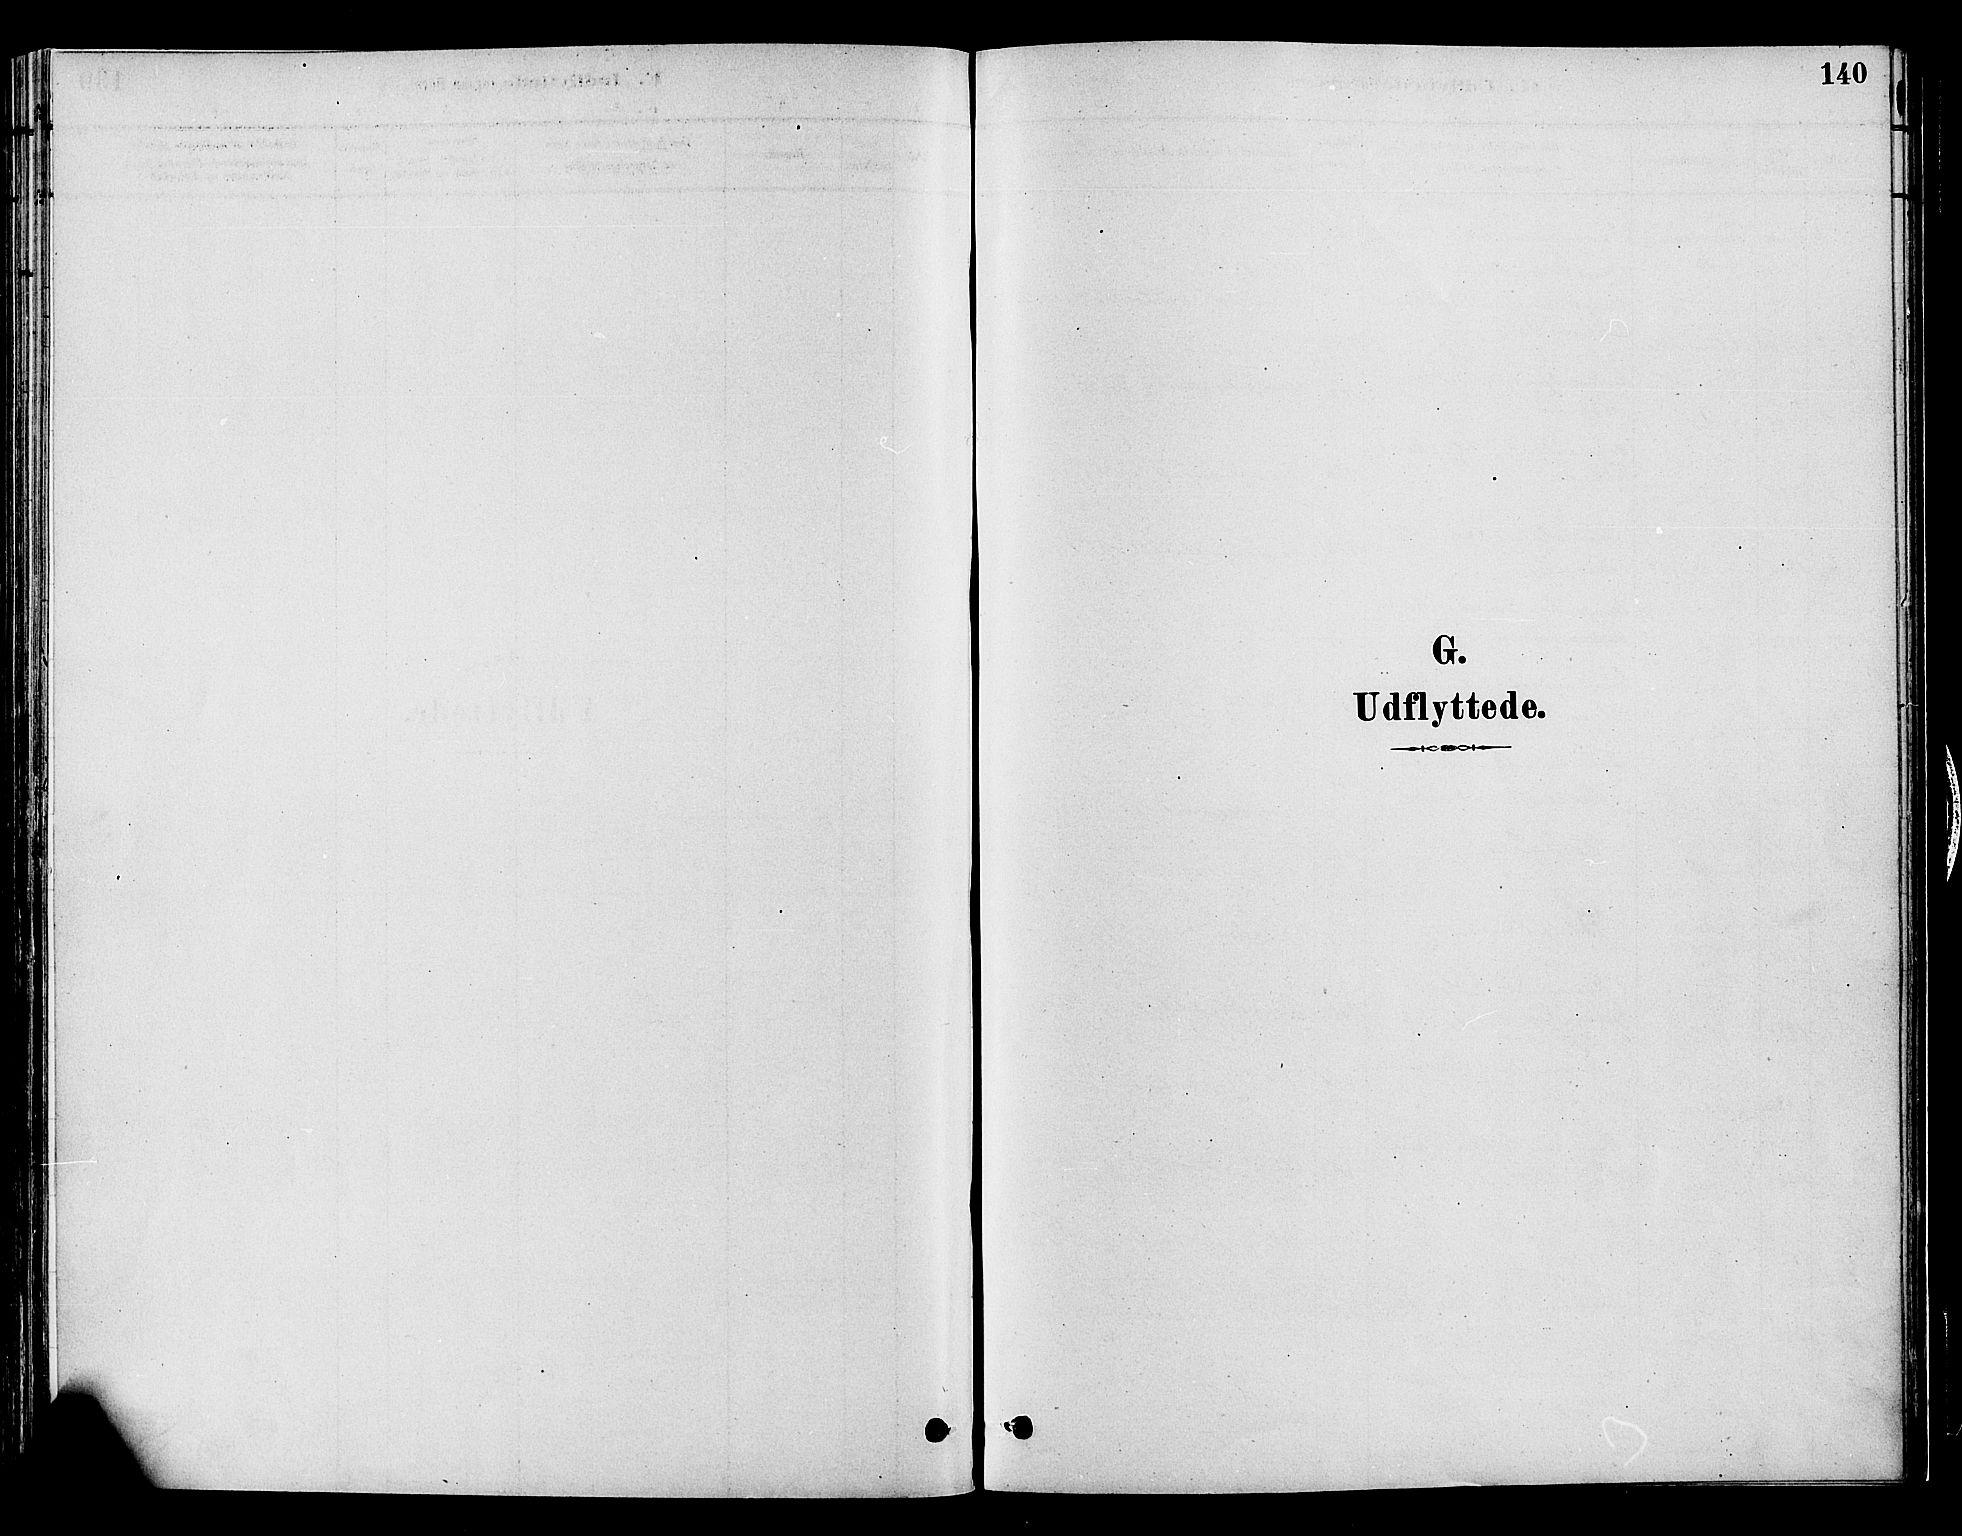 SAH, Gran prestekontor, Ministerialbok nr. 15, 1880-1888, s. 140